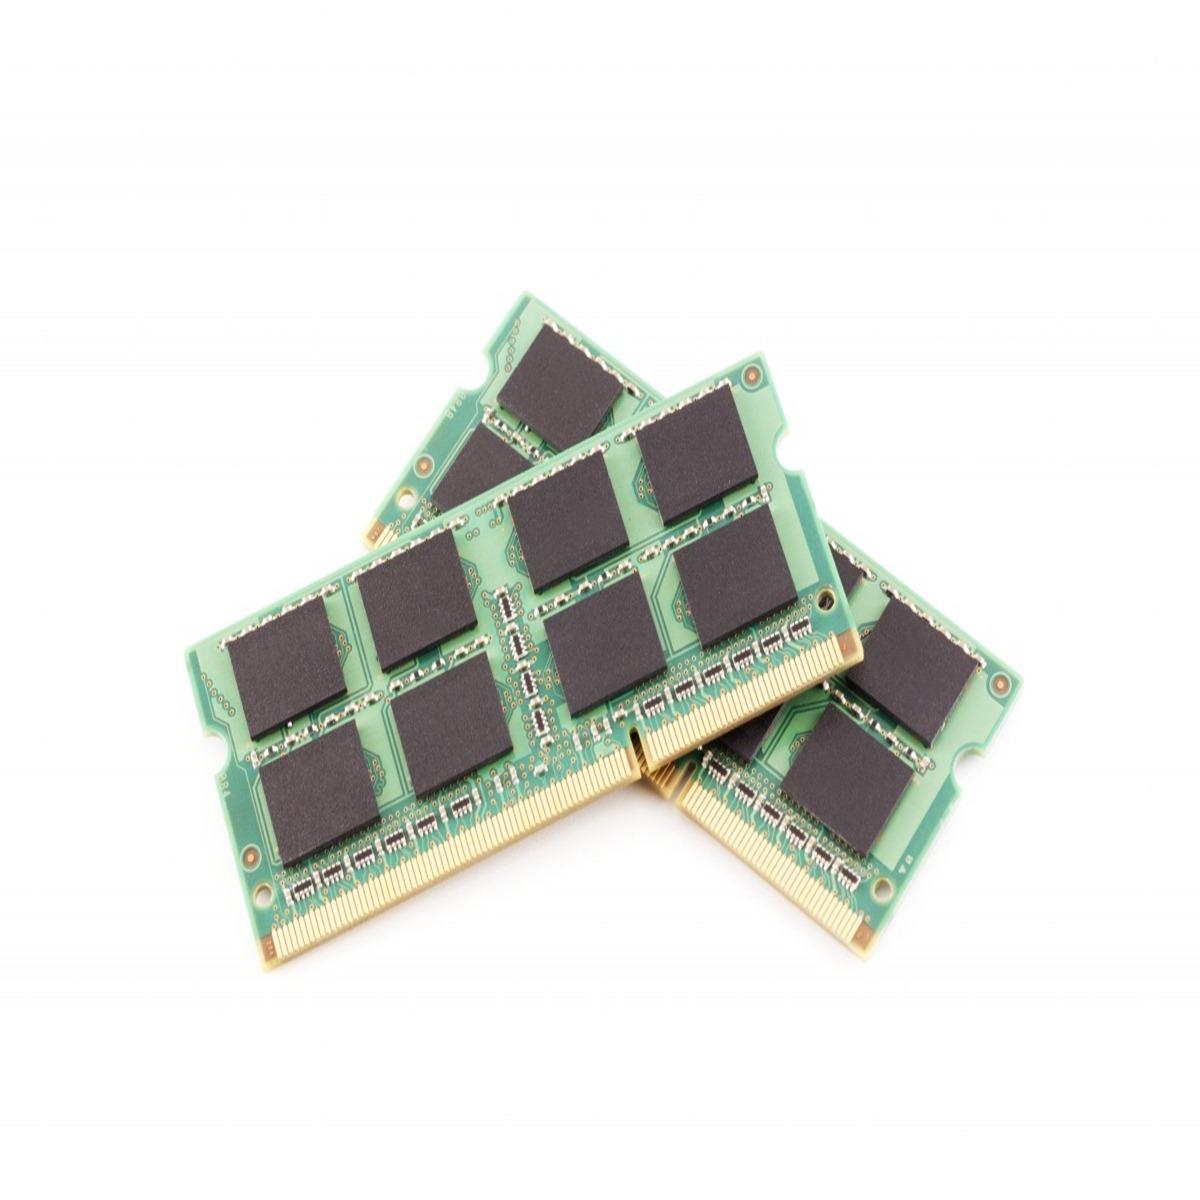 Memoria Multilaser 8GB Sodimm DDR3 Note 1600MHZ - MM820